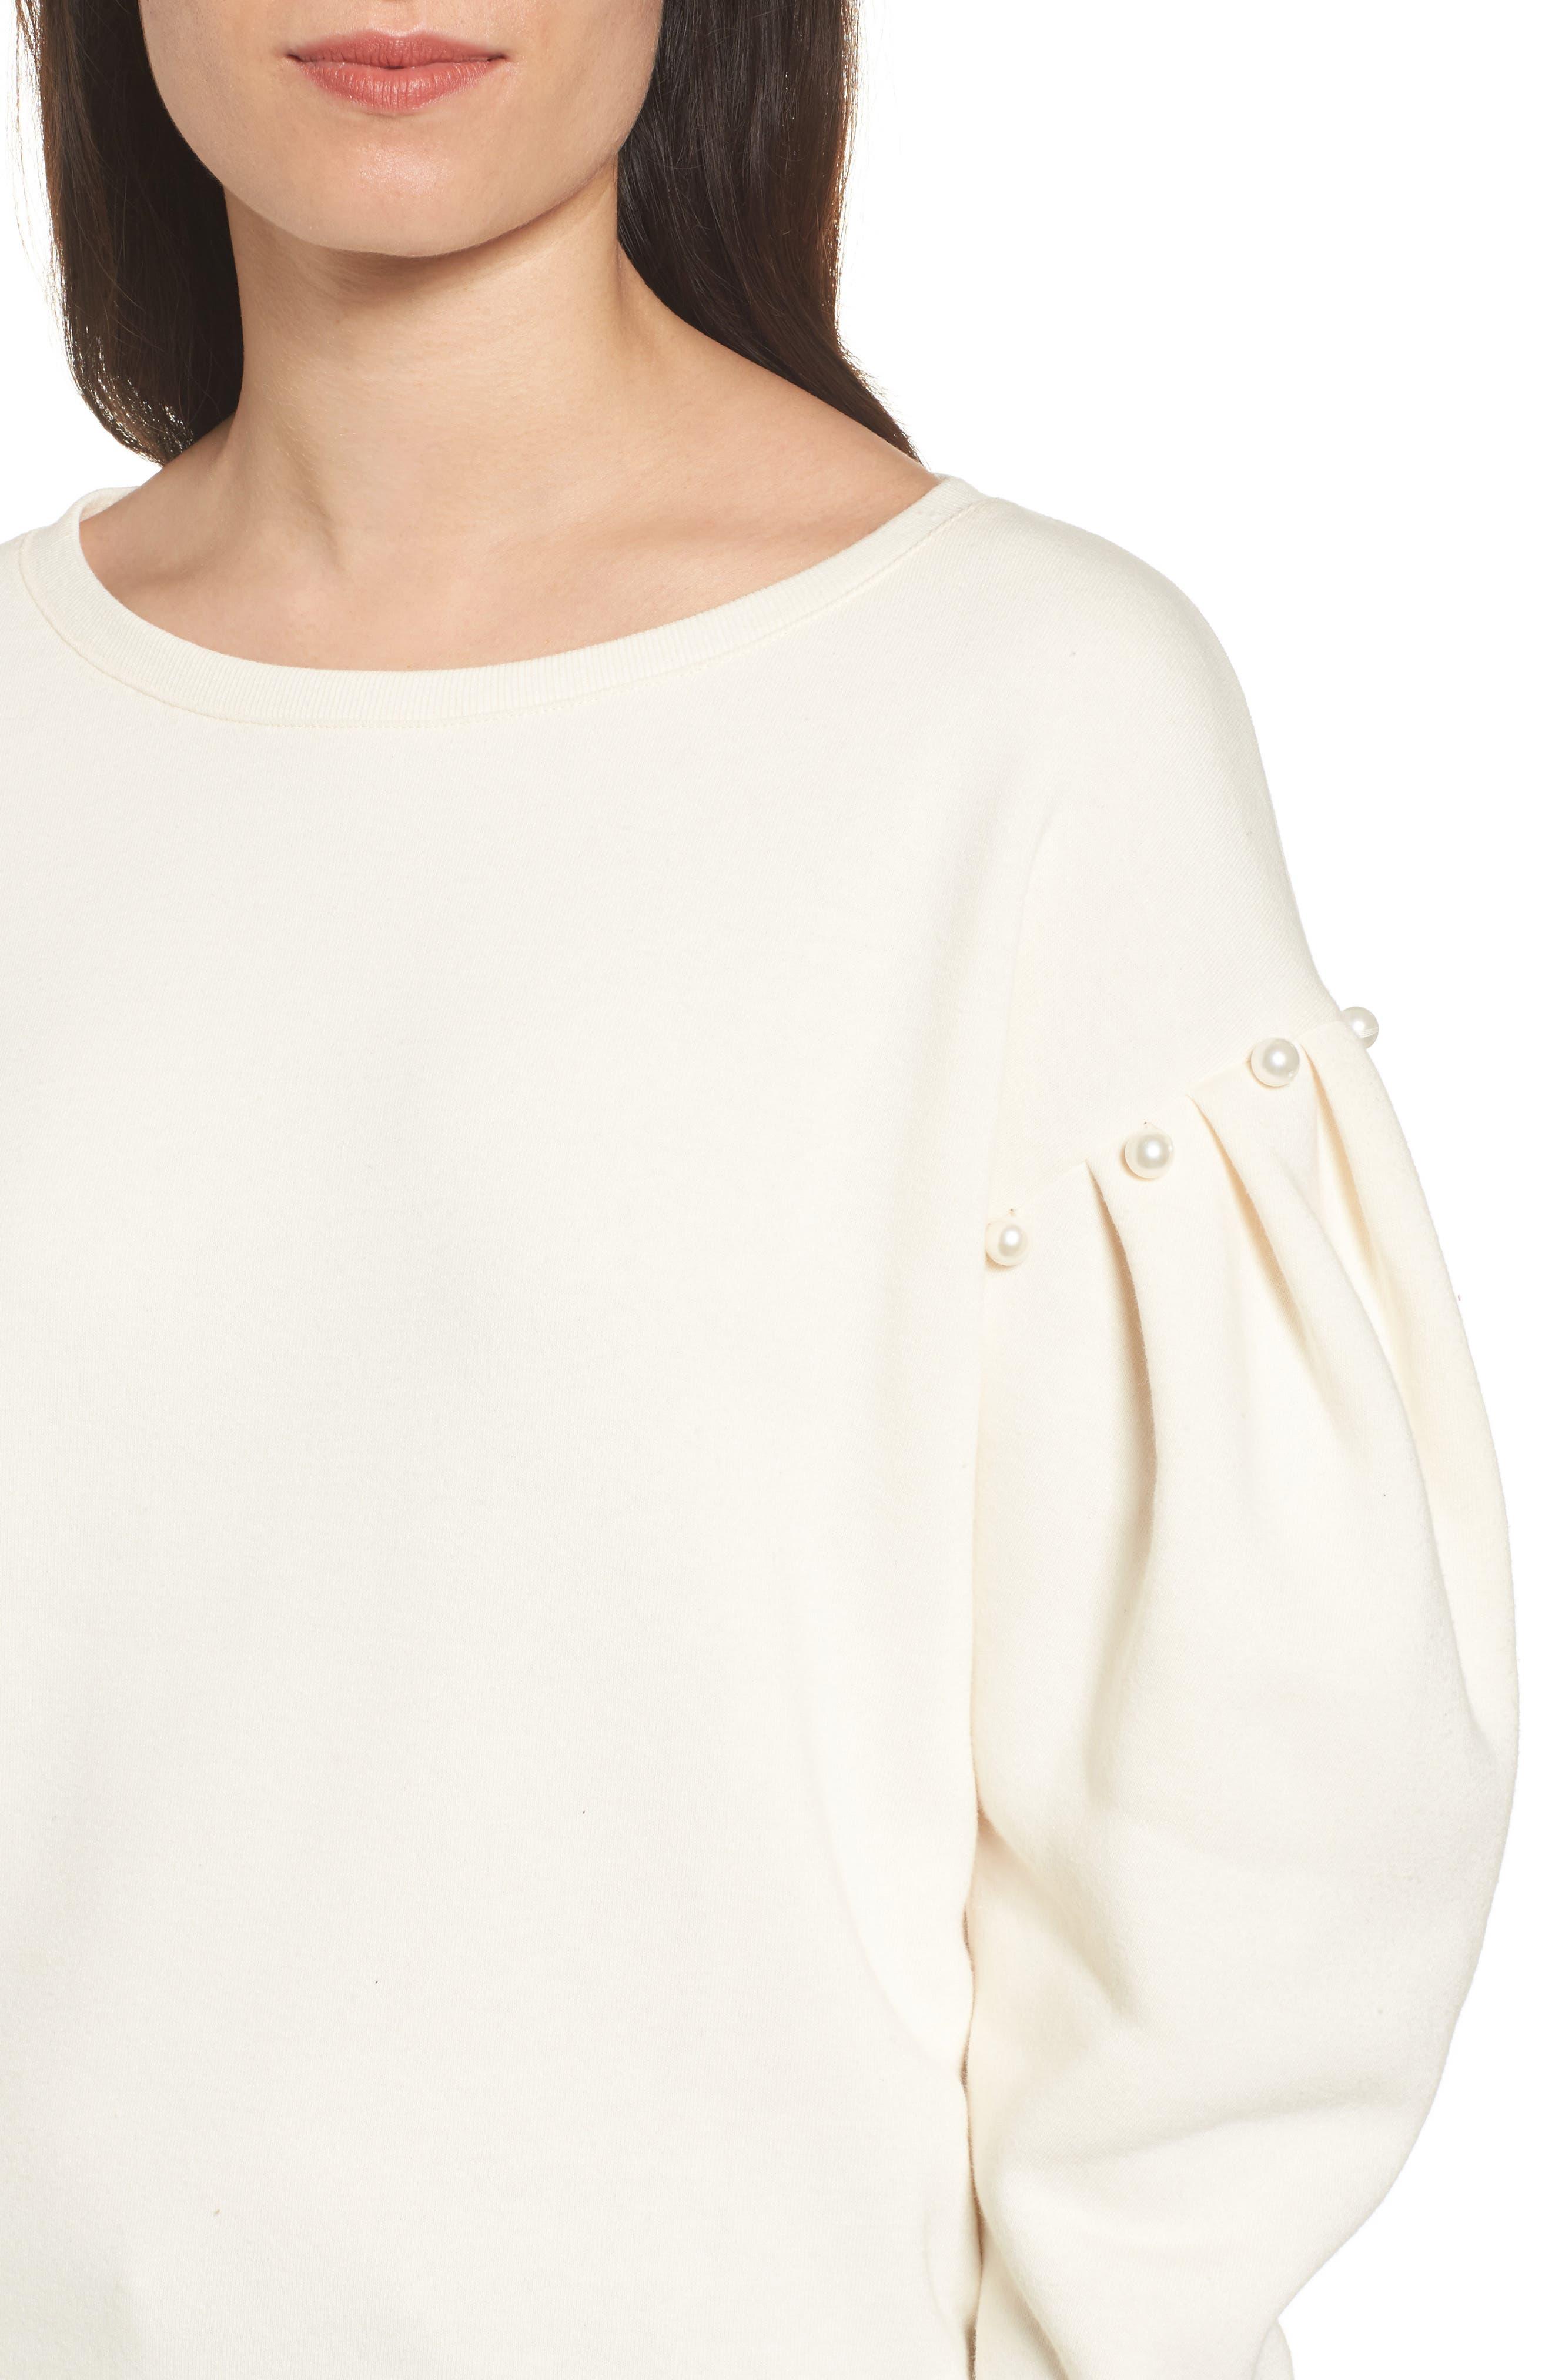 Ellison Sweatshirt,                             Alternate thumbnail 4, color,                             Off White